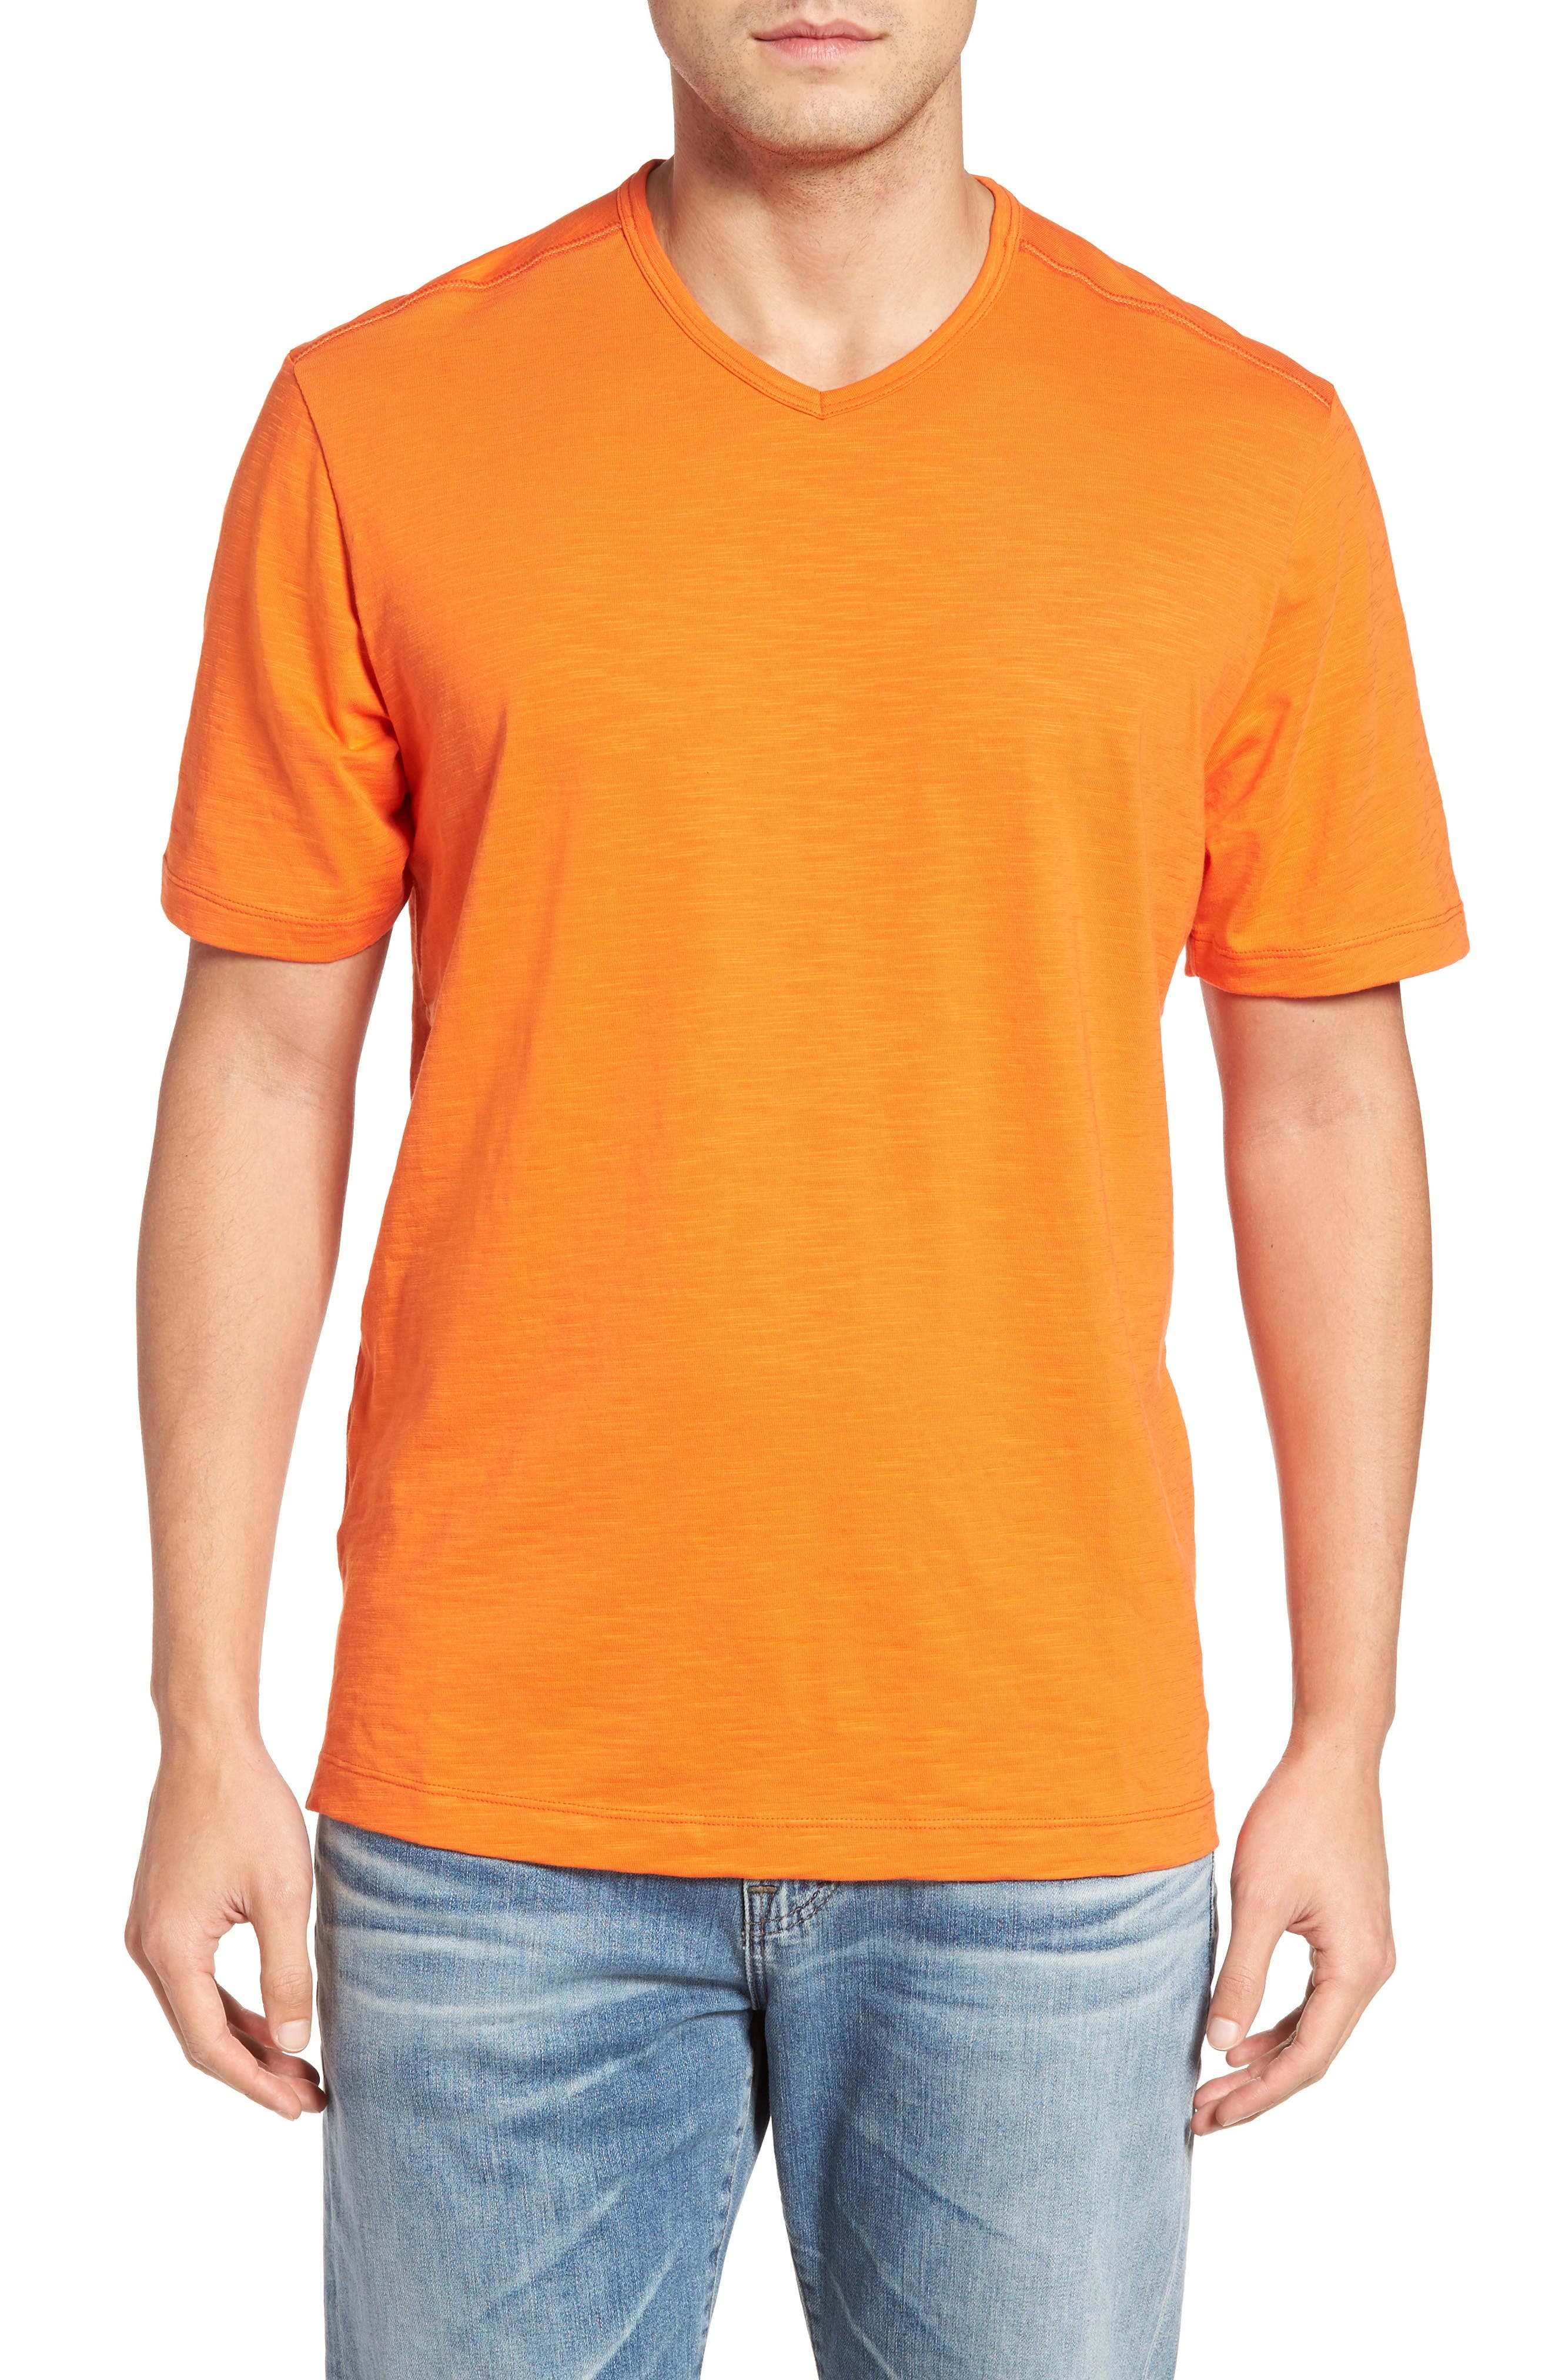 Main Image - Tommy Bahama 'Portside Player' Pima Cotton T-Shirt